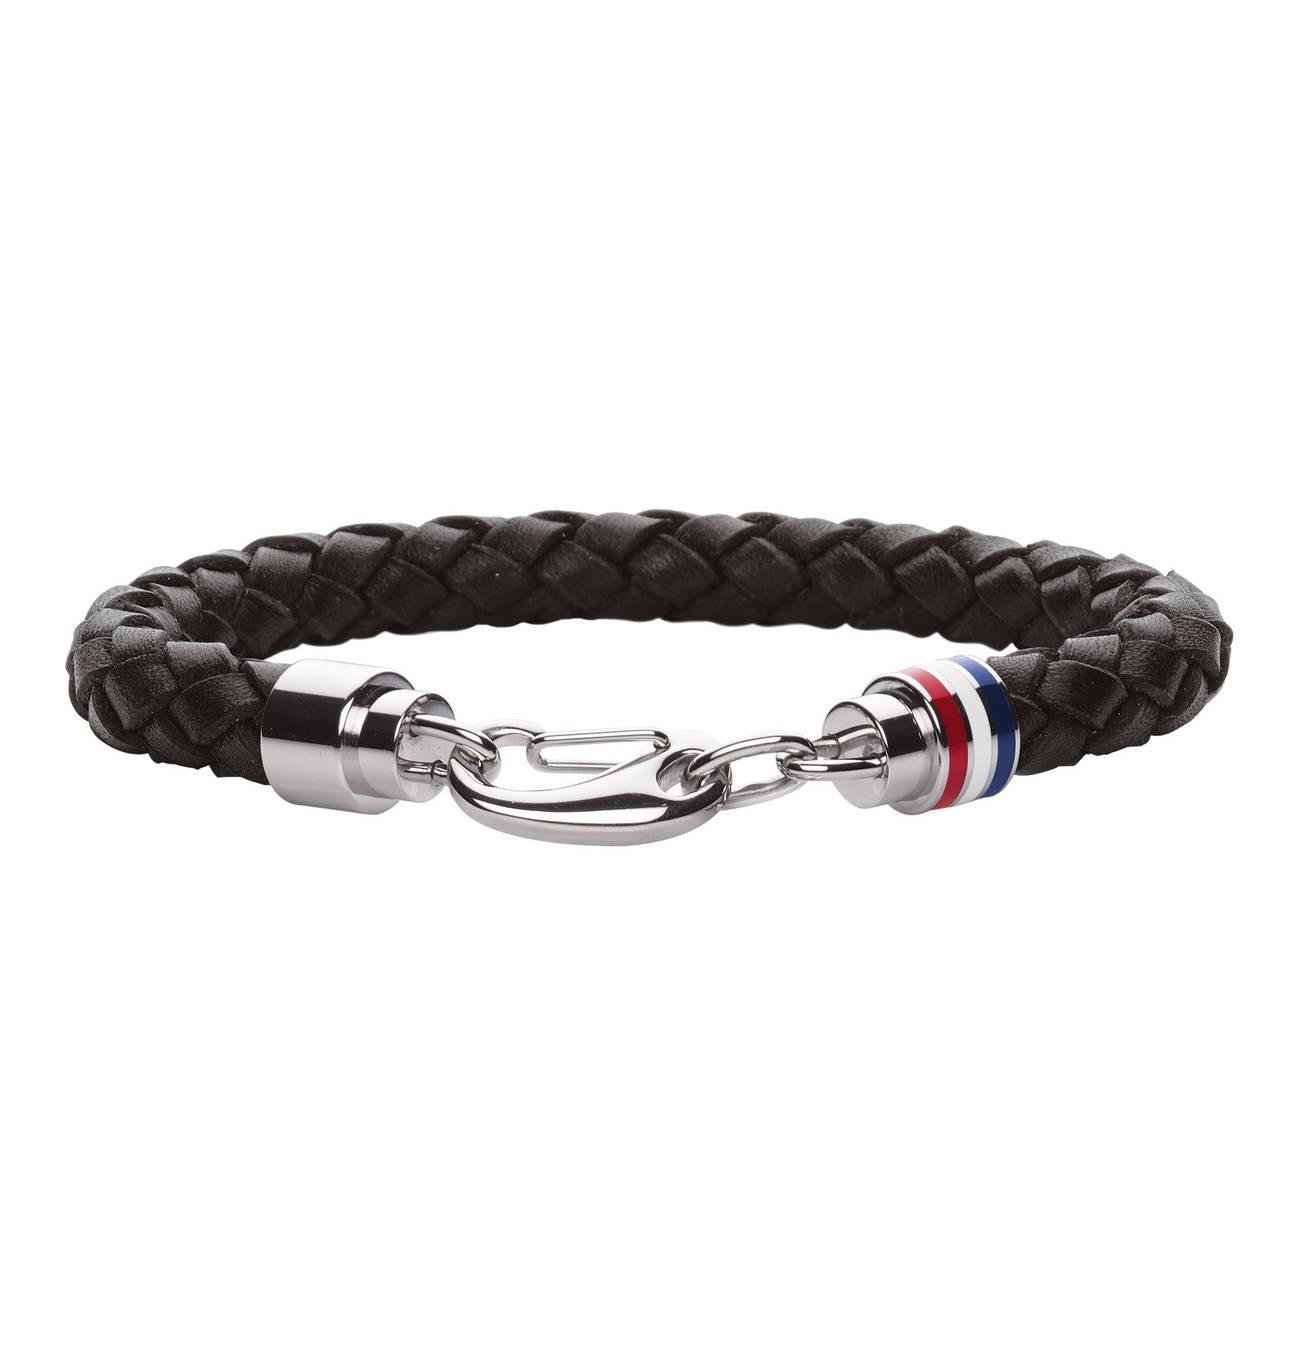 500ebf26a8 Tommy Hilfiger Armband